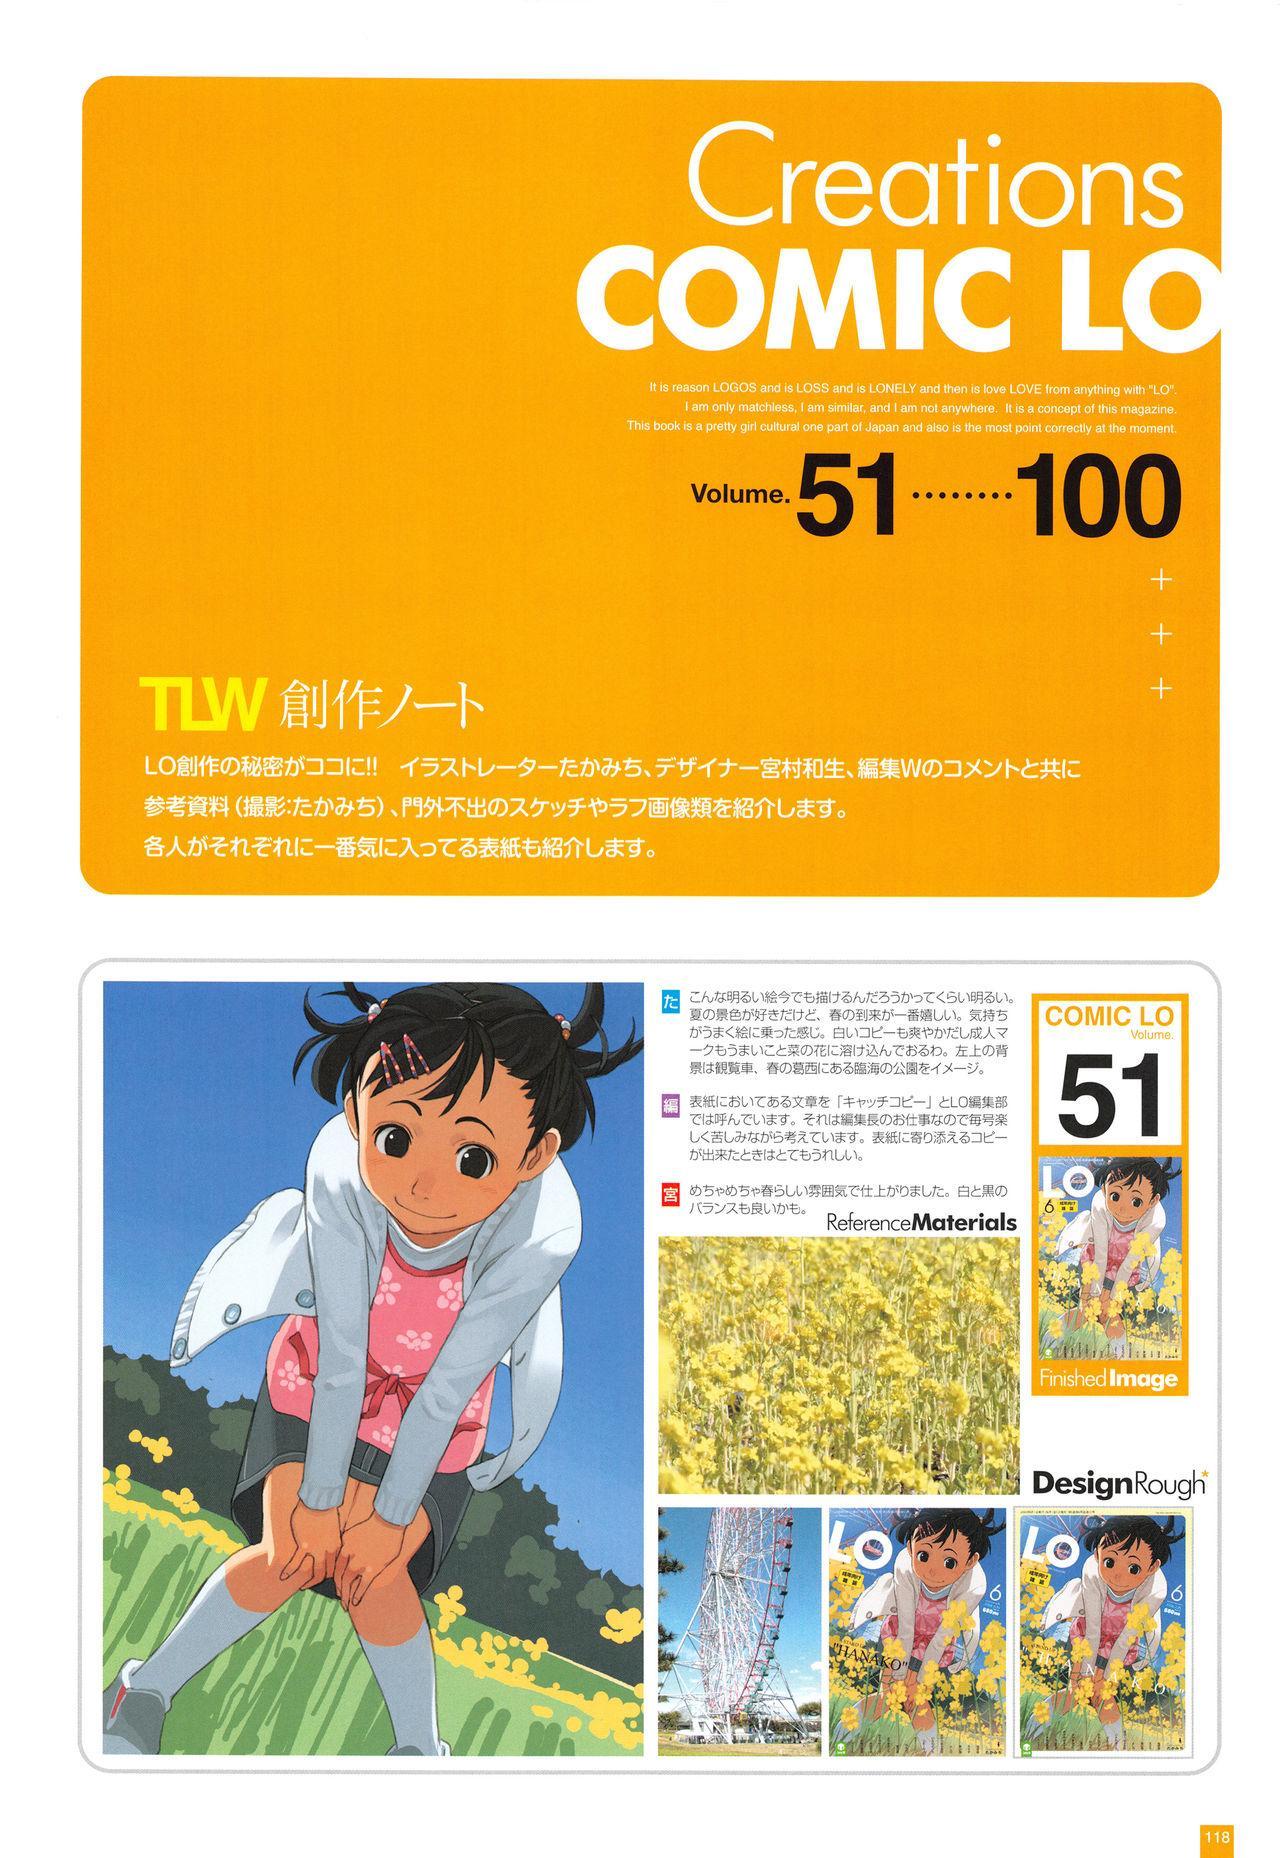 LO Artbook 2-A TAKAMICHI LOOP WORKS 120